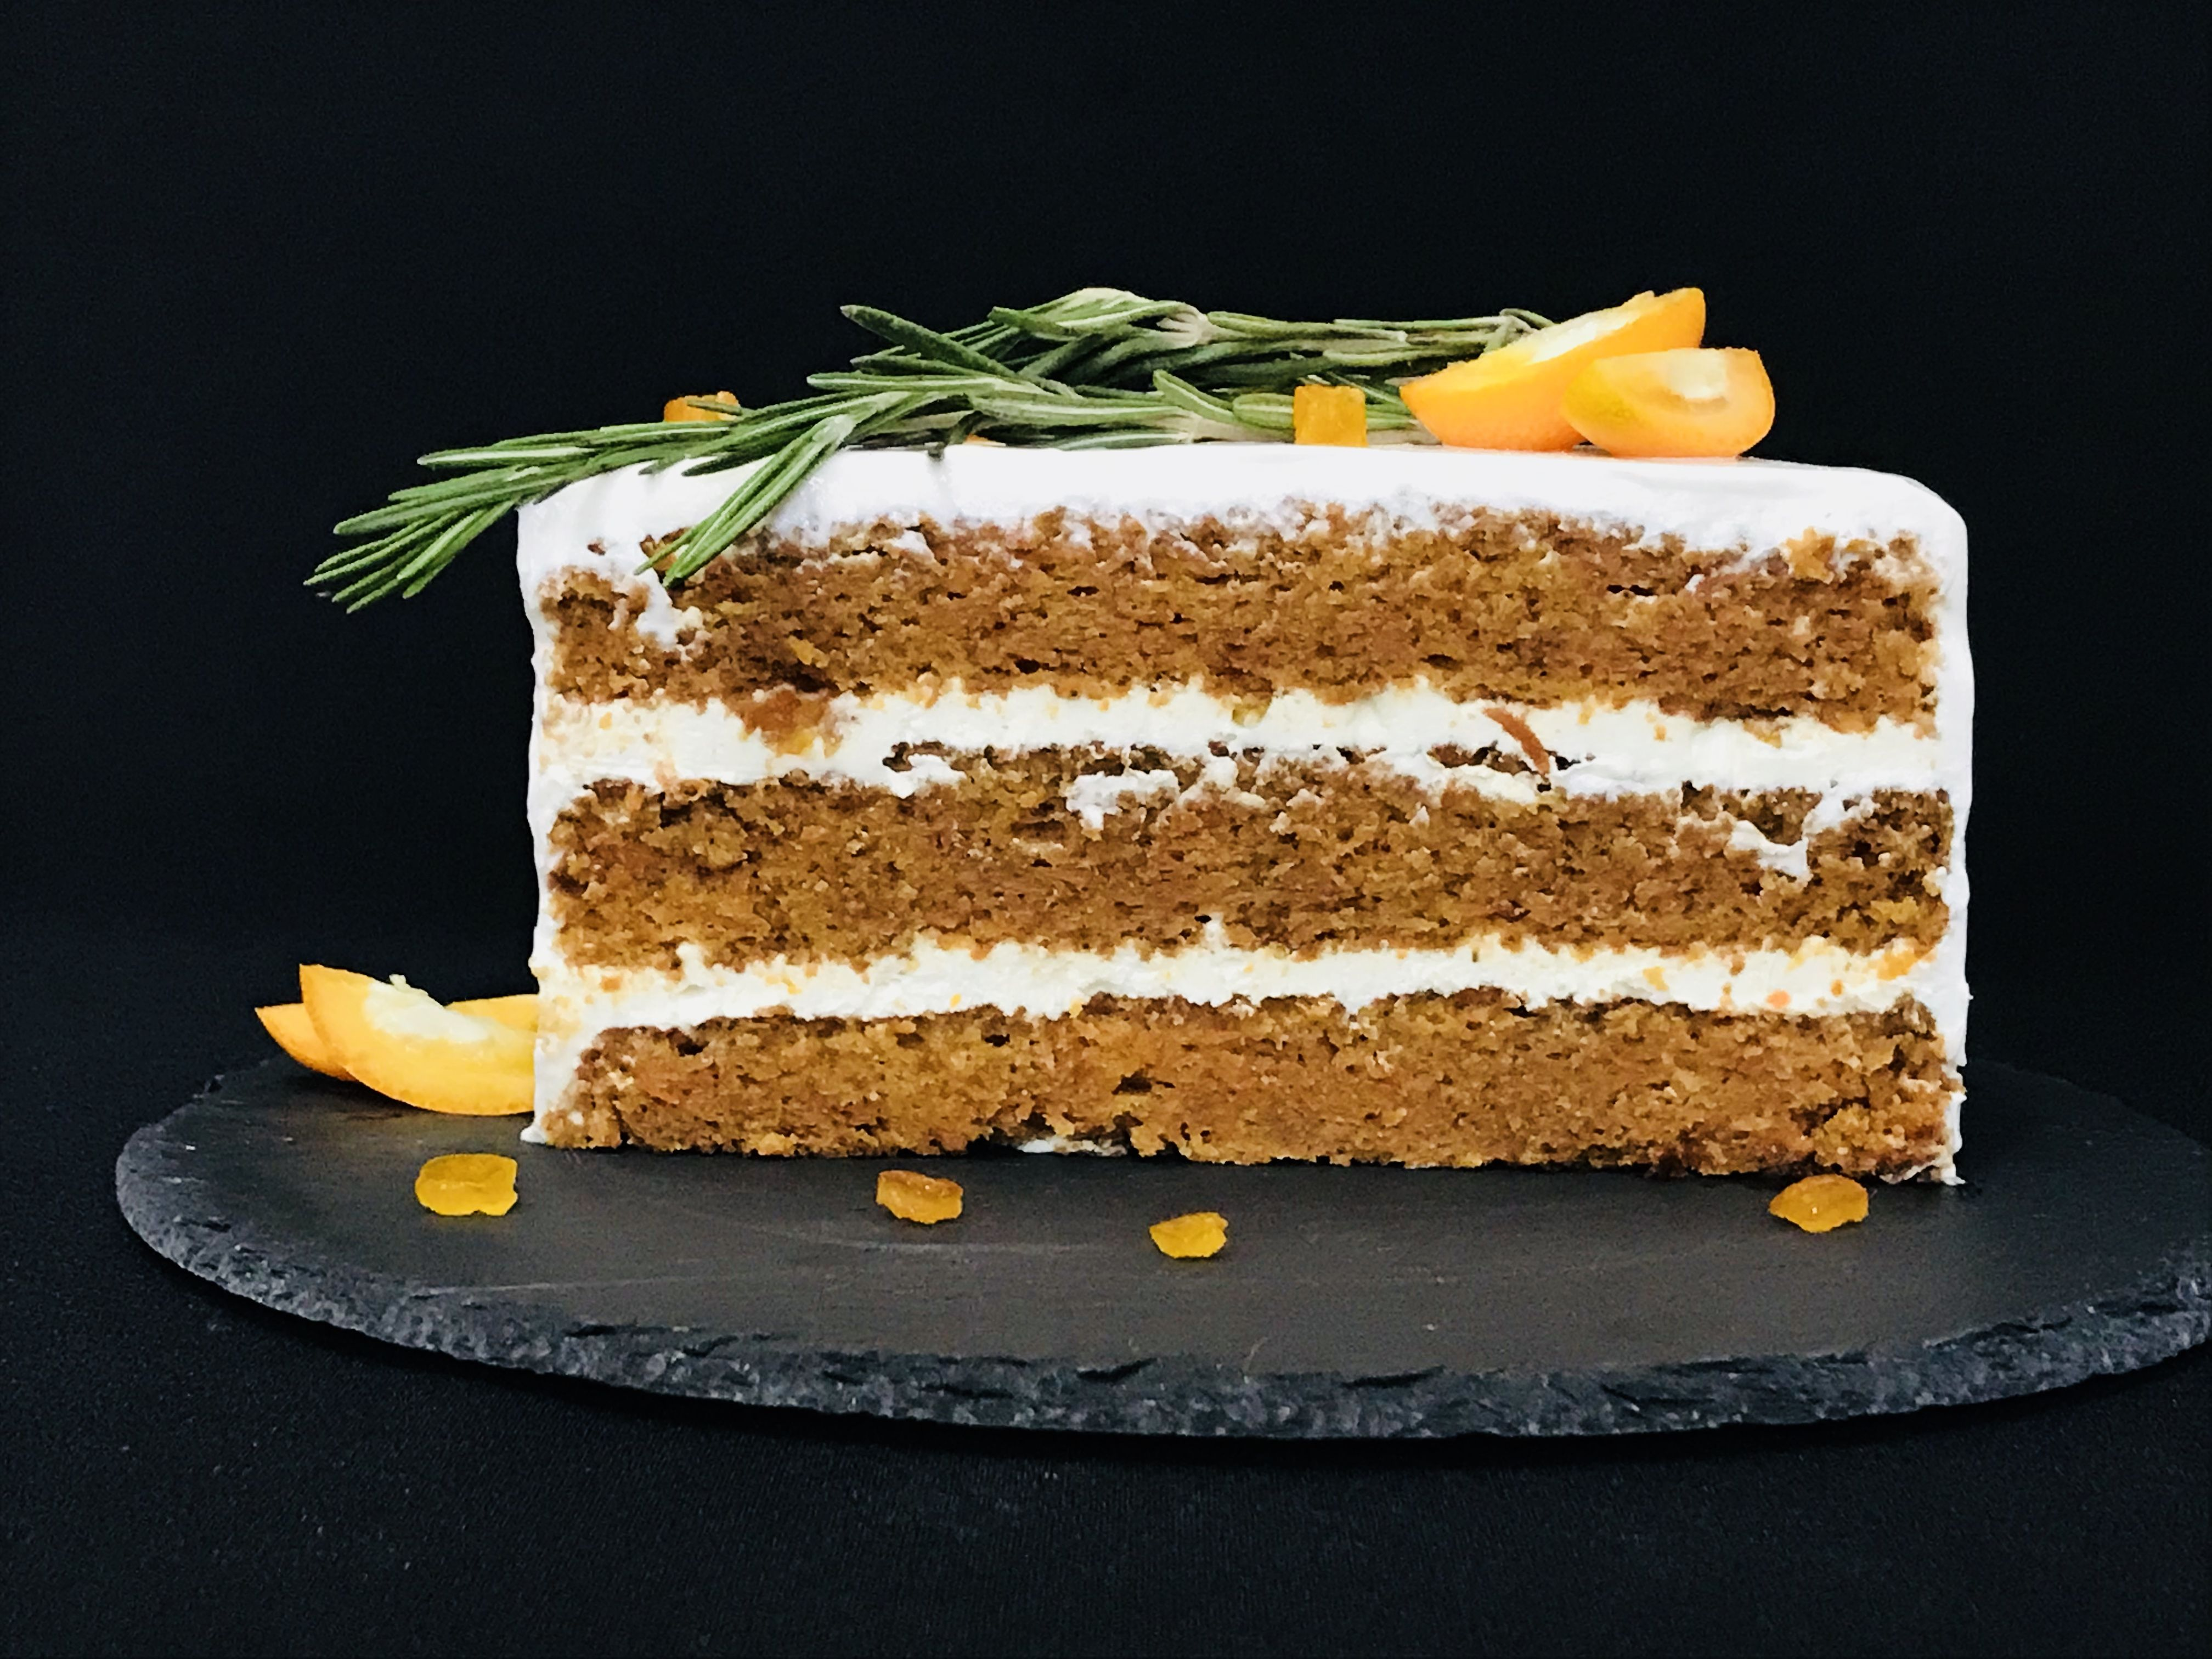 Торт с пчелкой майей фото крайней мере